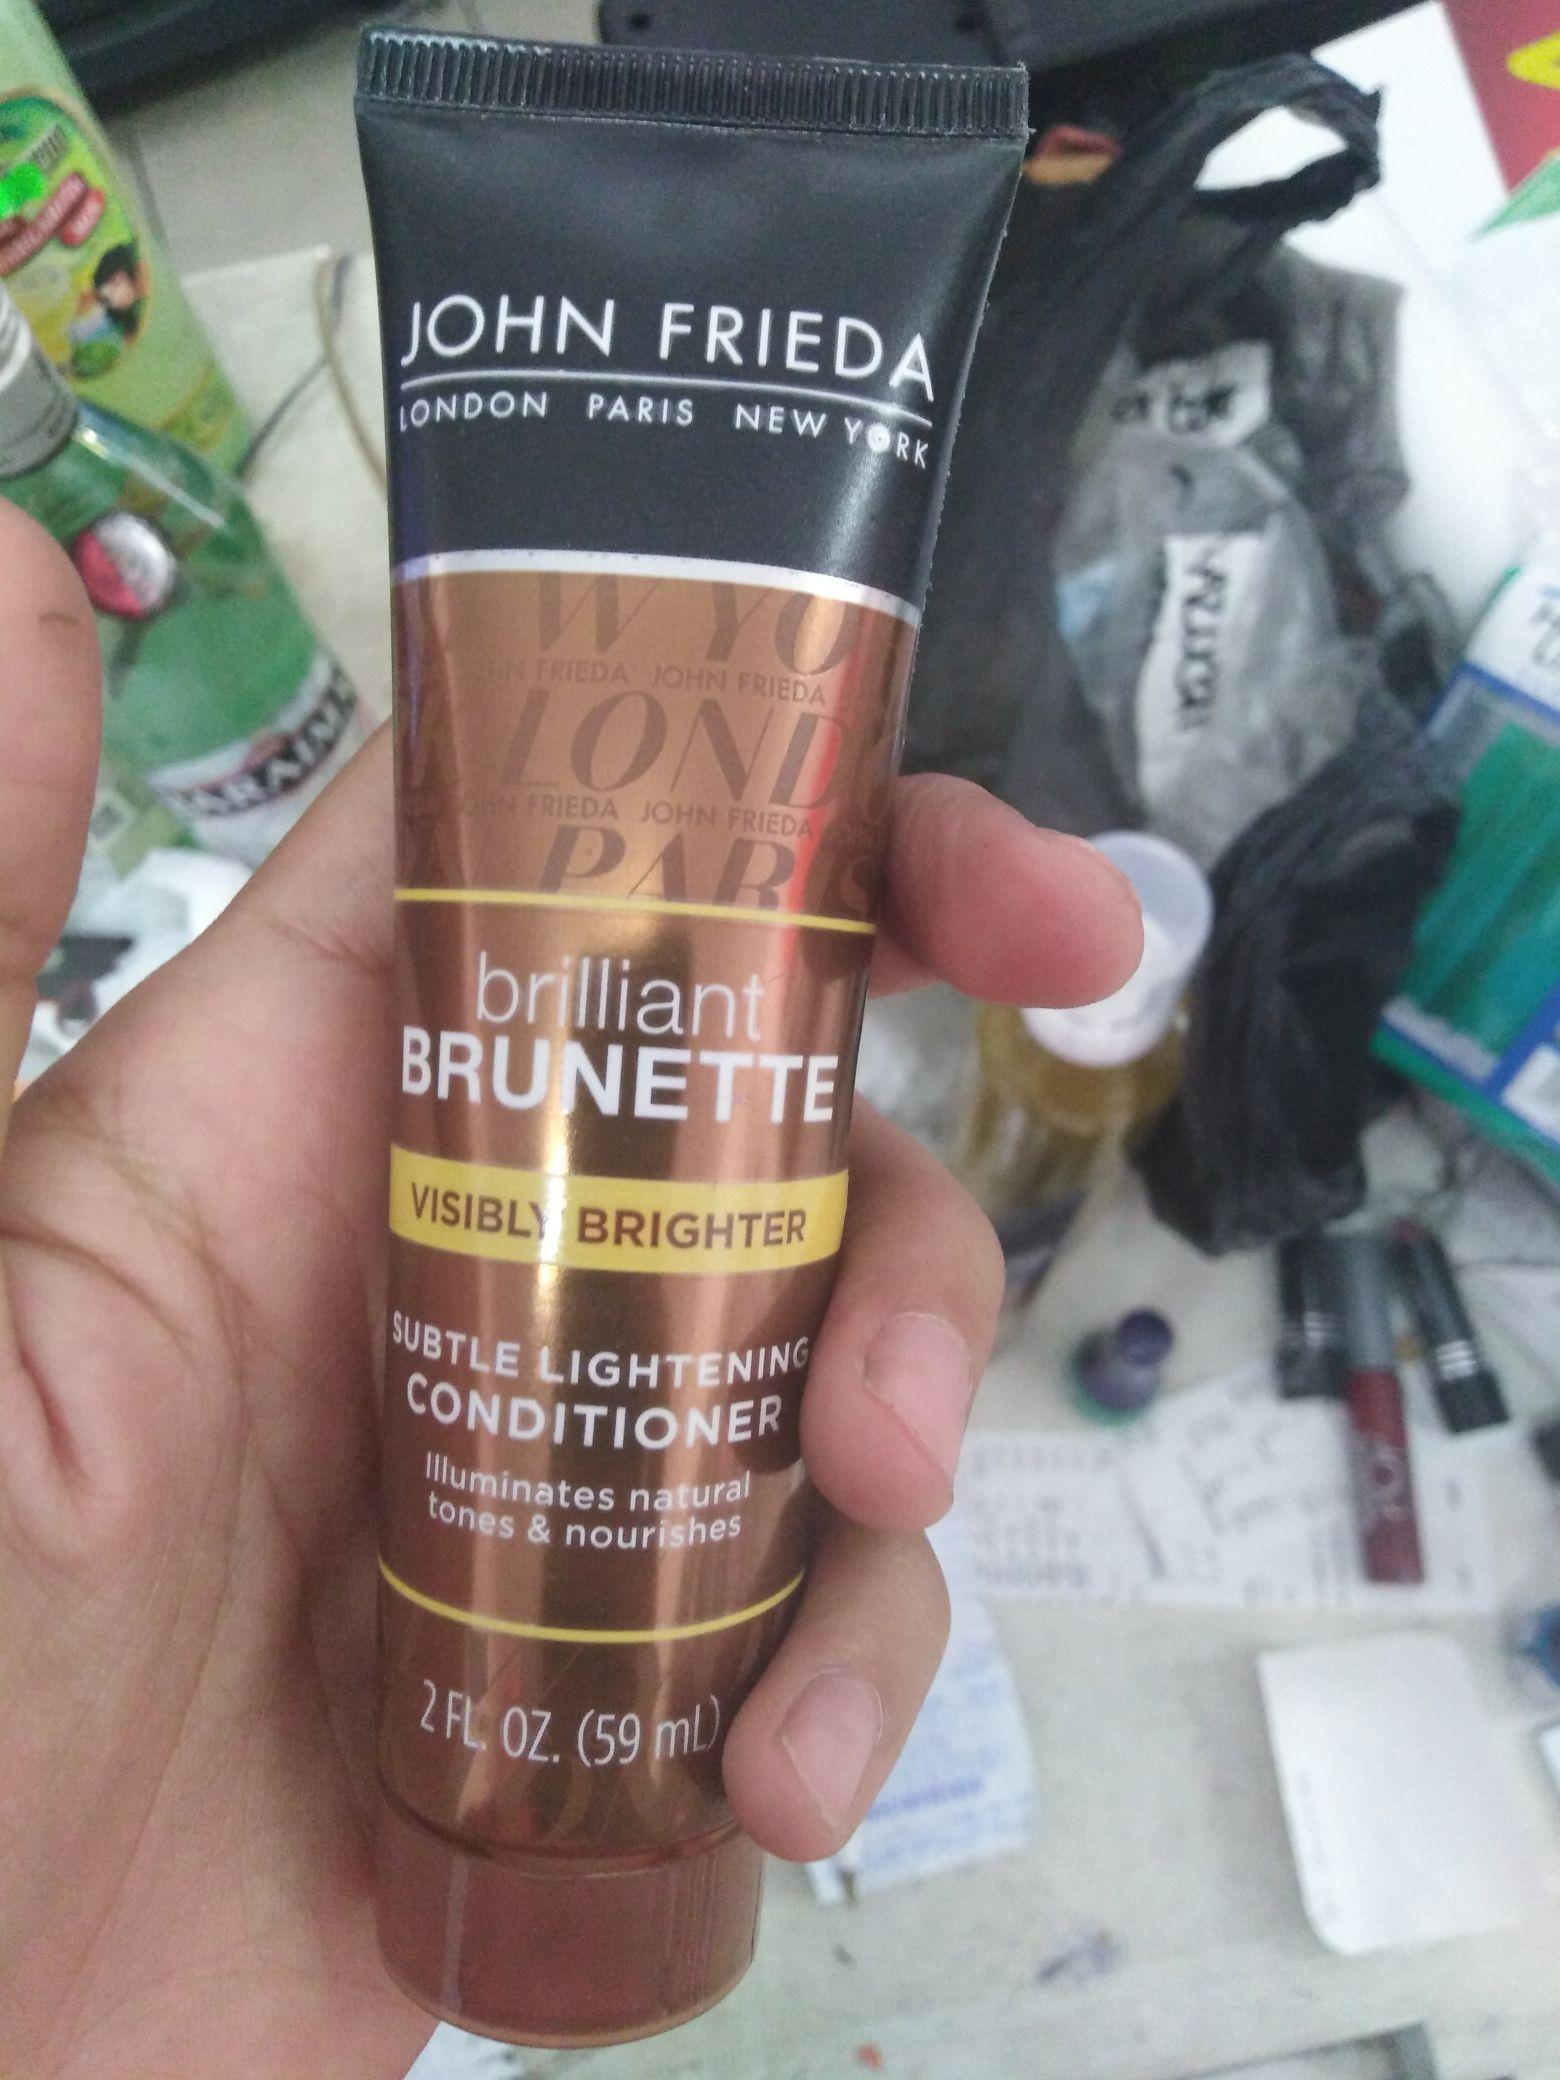 Chedraui: Shampoo John frieda